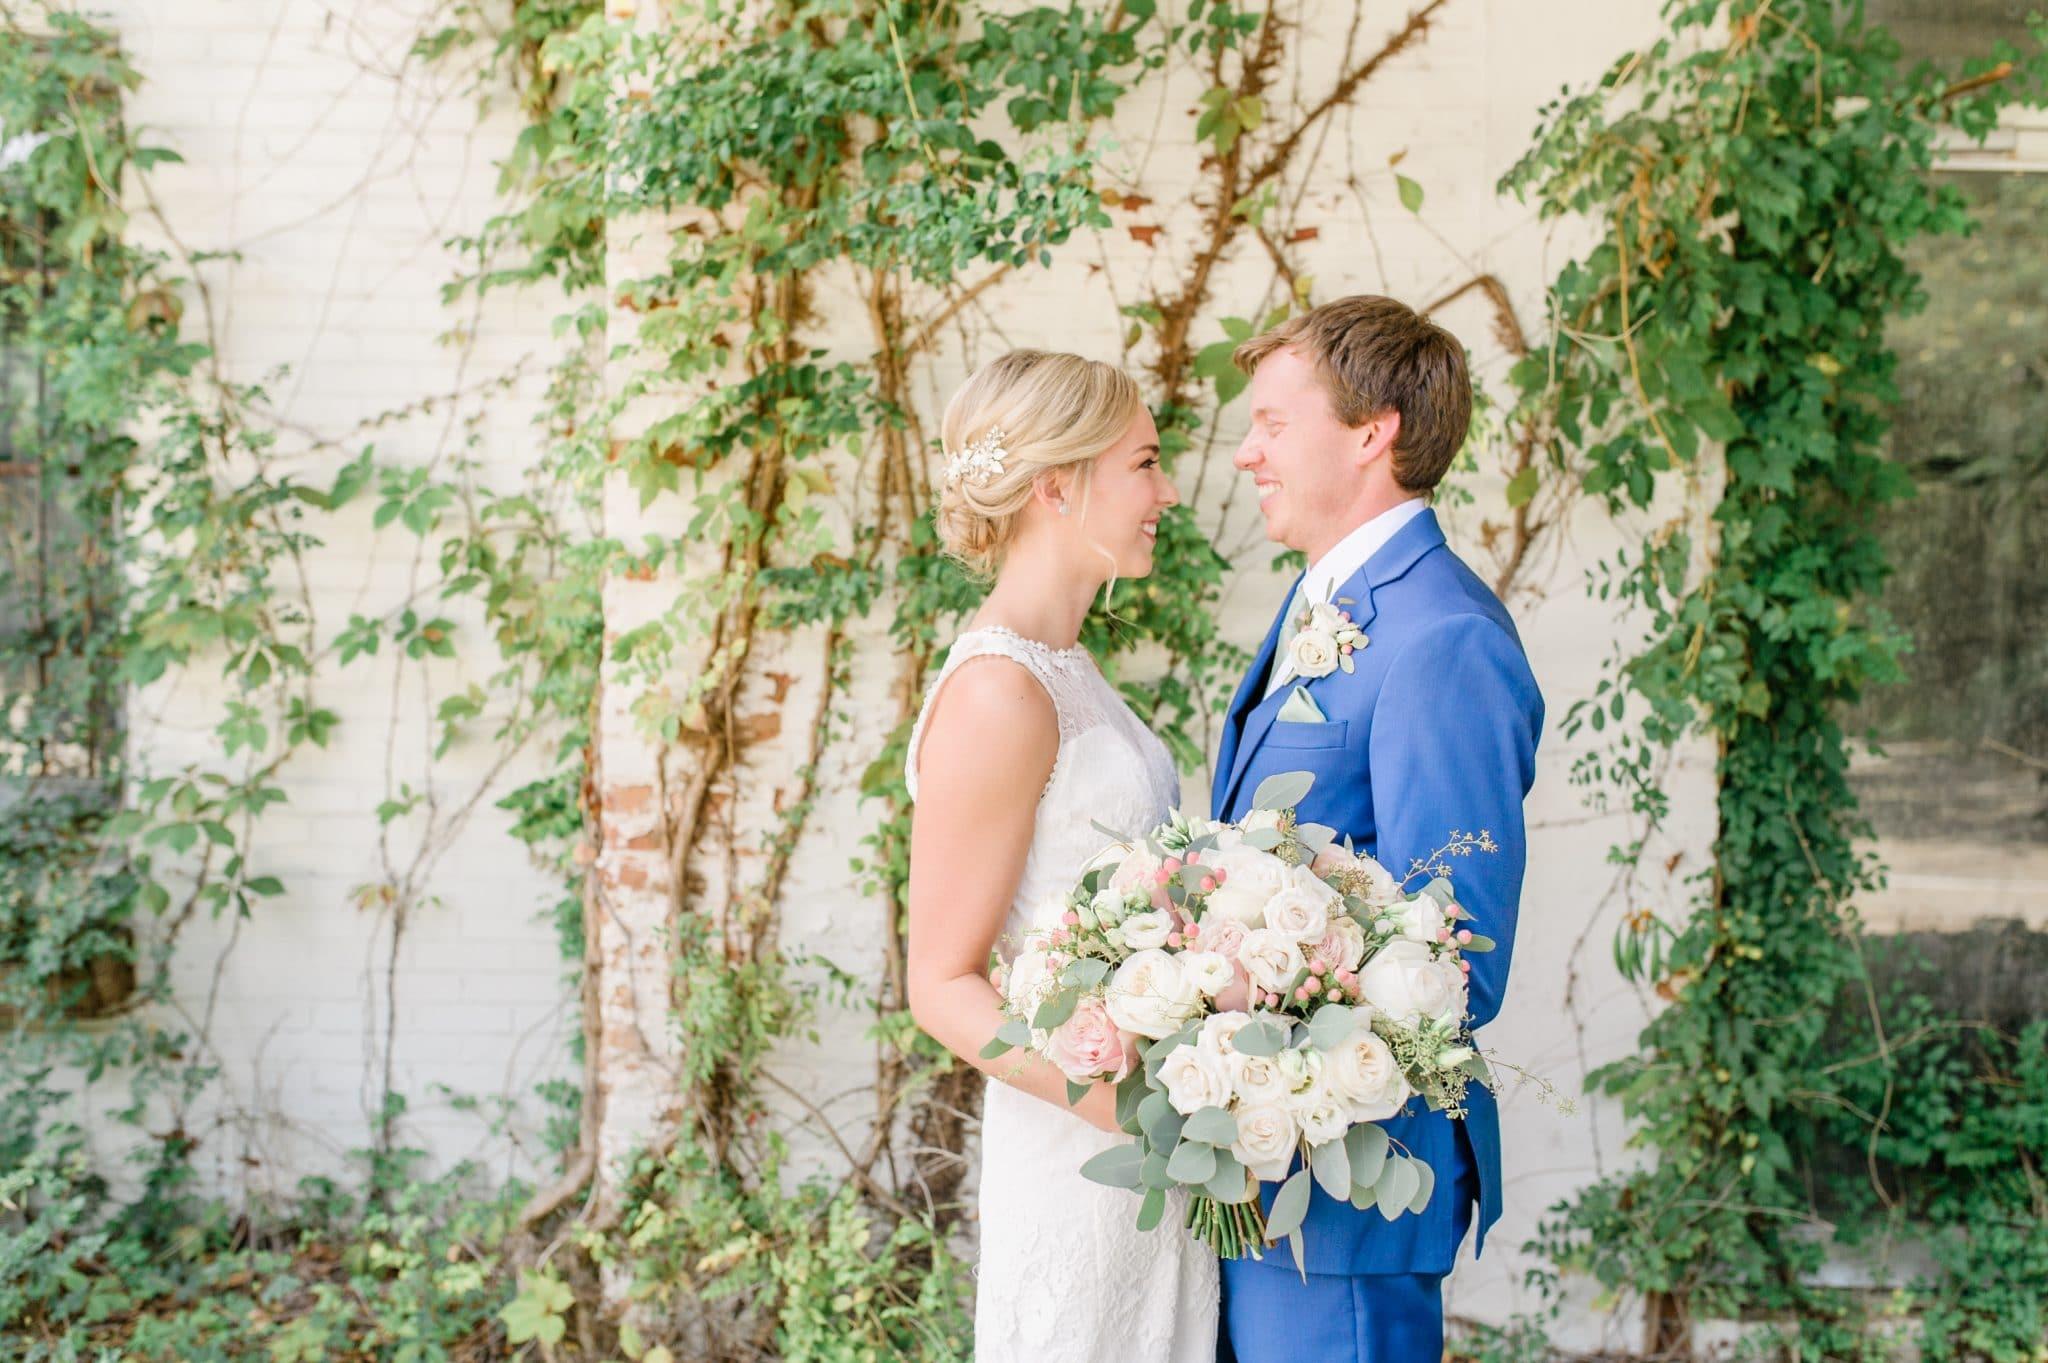 Macon Georgia Wedding Venue- New City Weddings | Sara & Robert